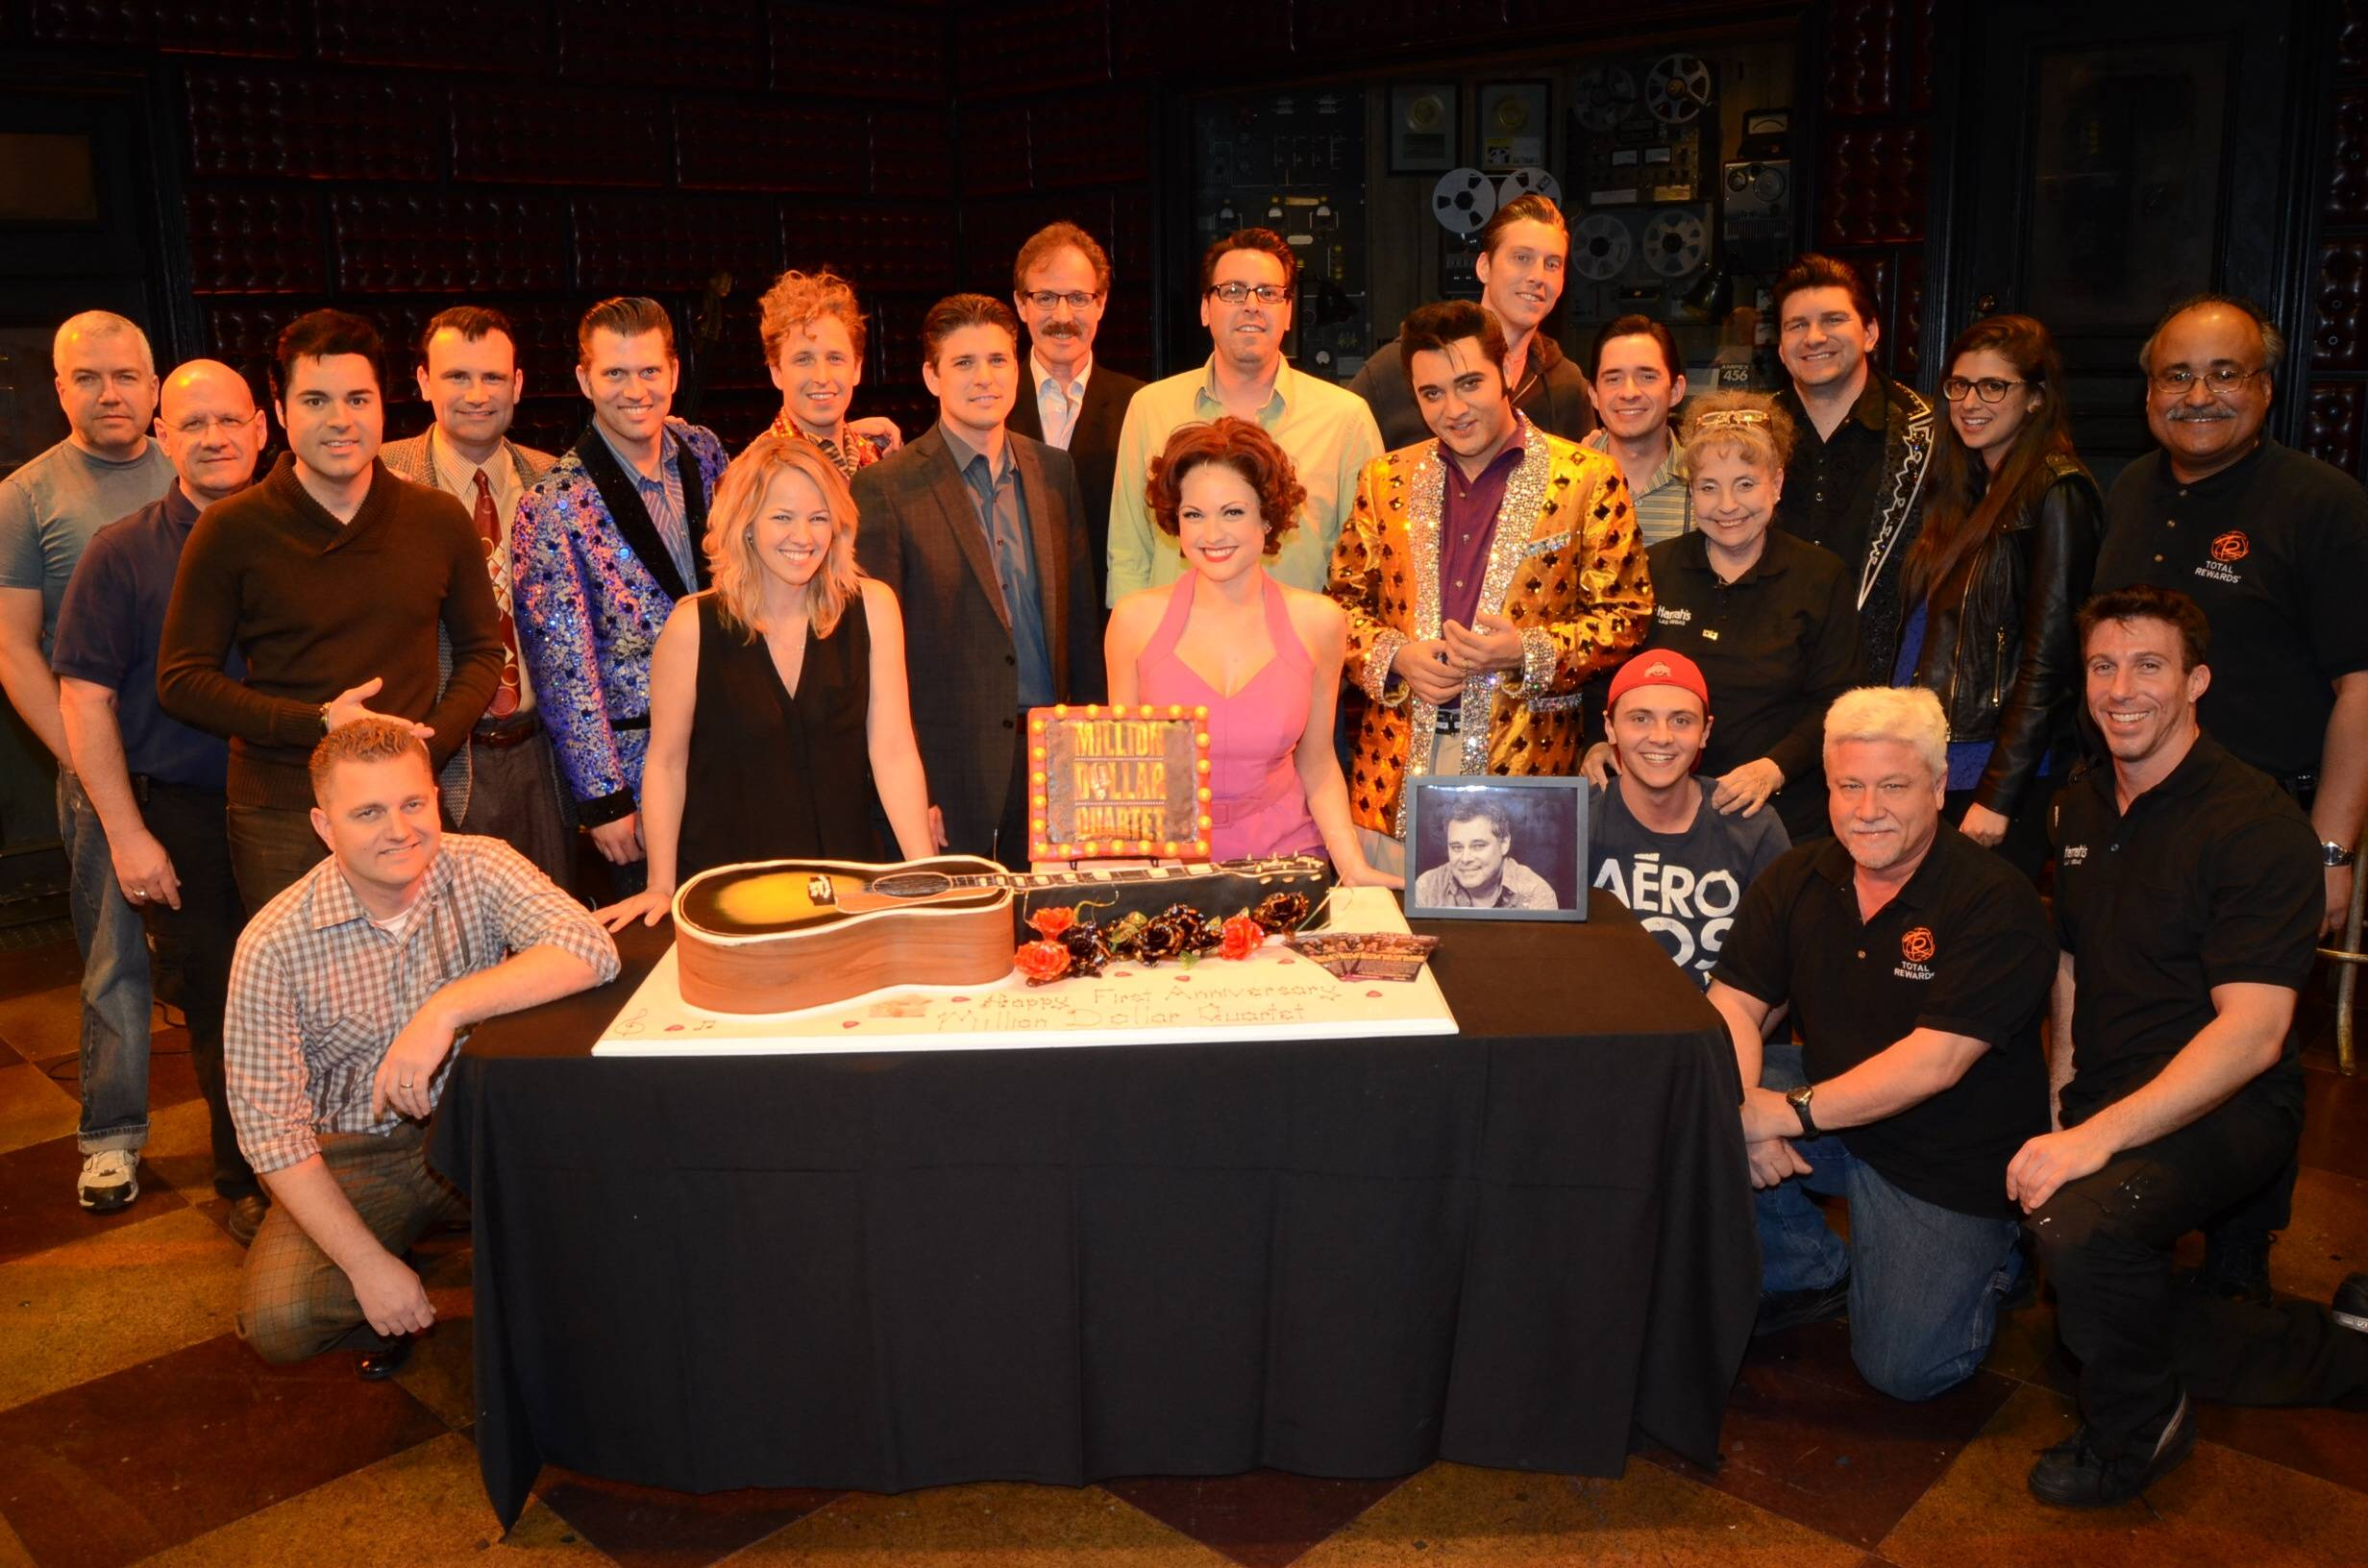 Full Million Dollar Quartet Las Vegas Company; First Anniversary 2.19.14 ©Caesars Entertainment